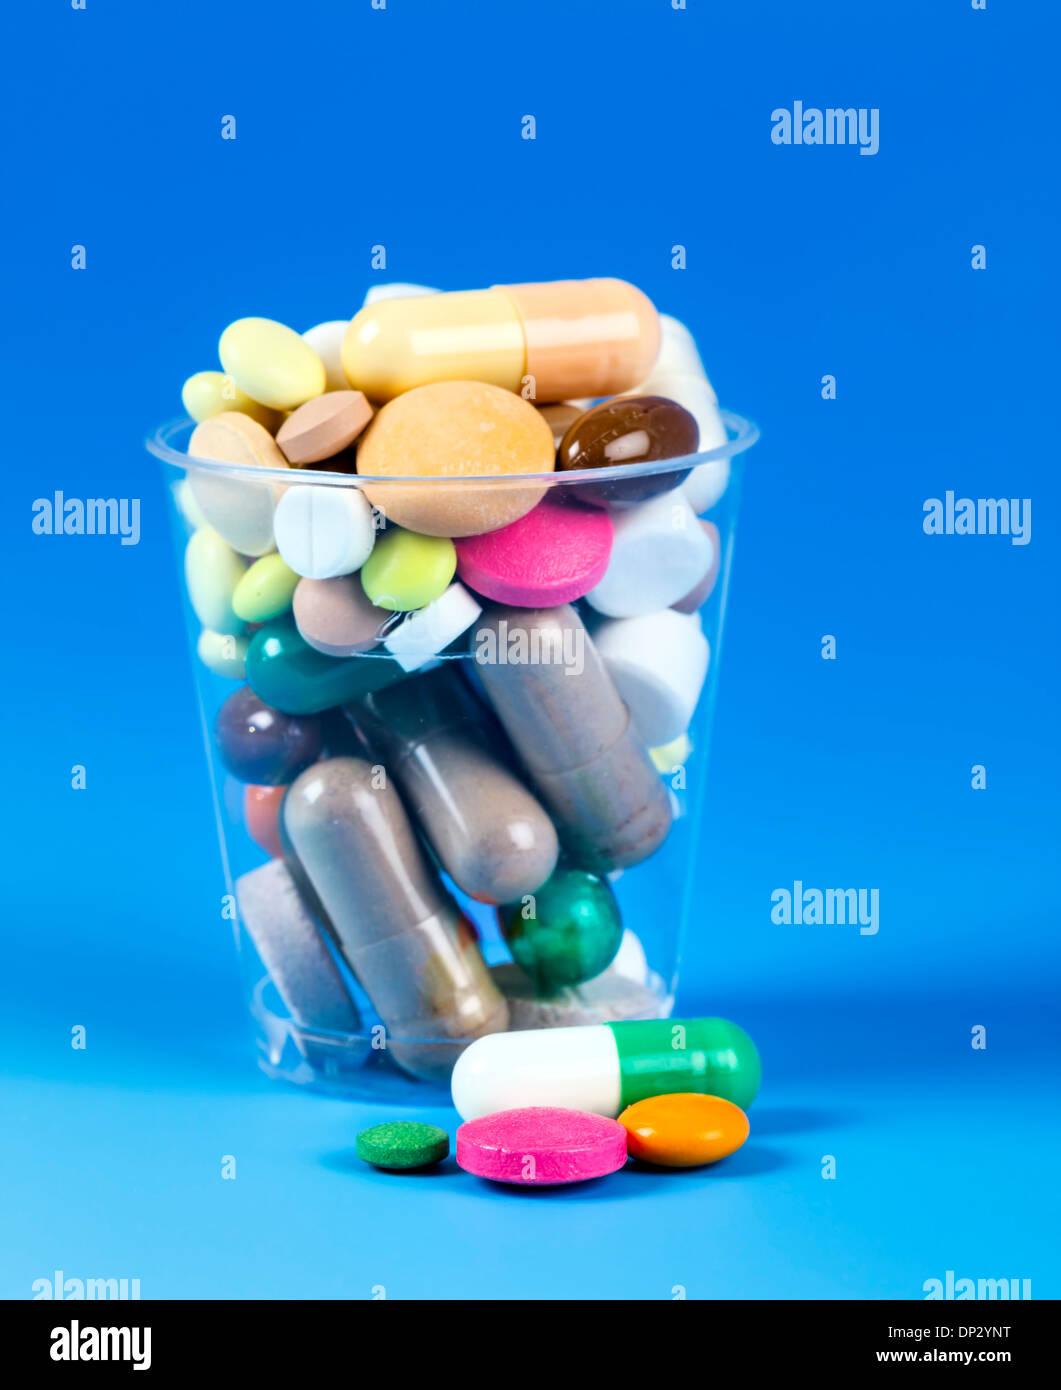 Overdose, conceptual image - Stock Image